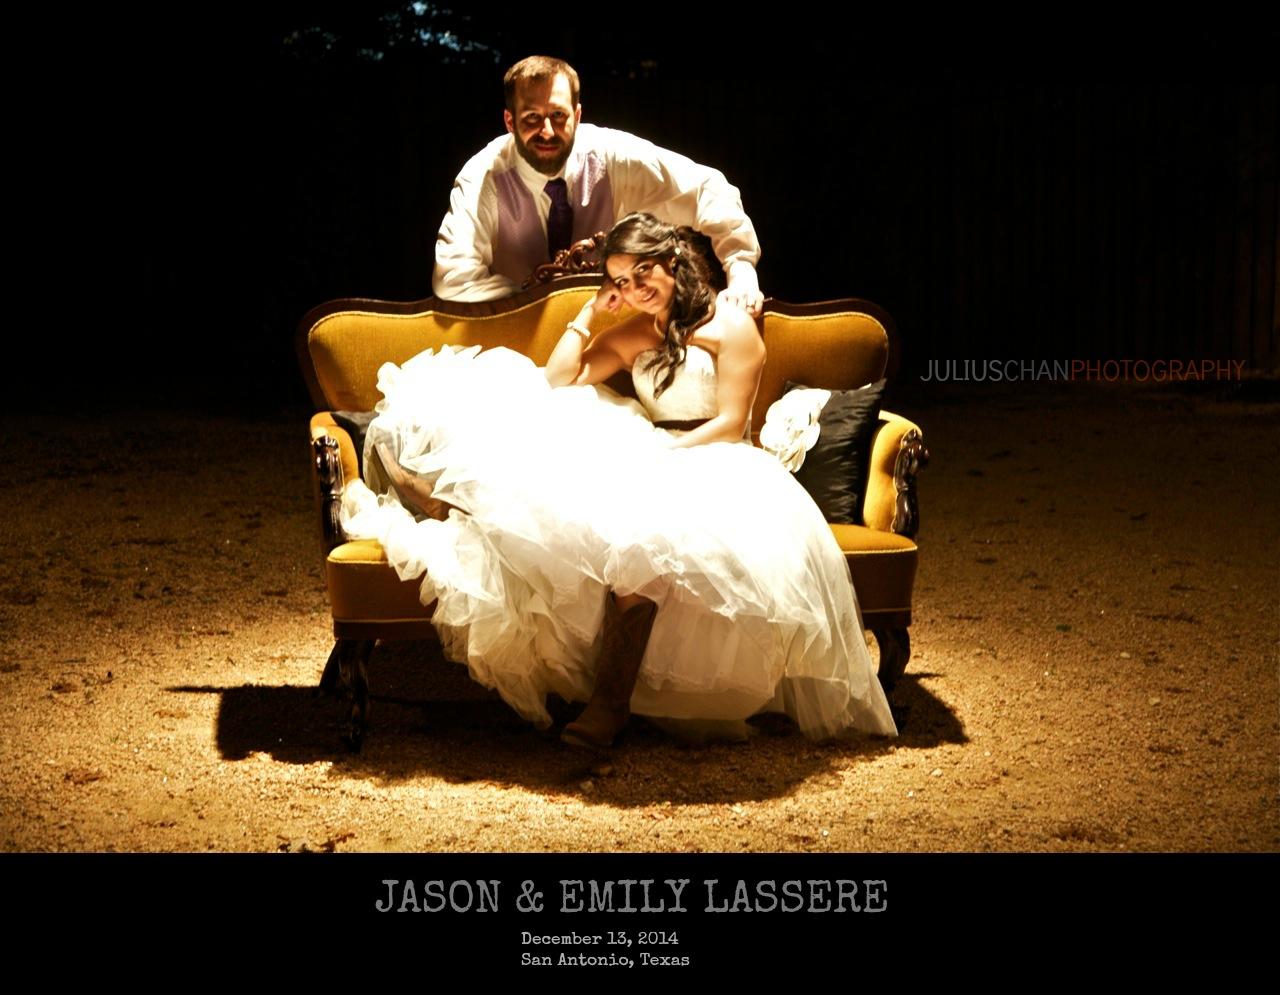 JasonEmily+Lassere